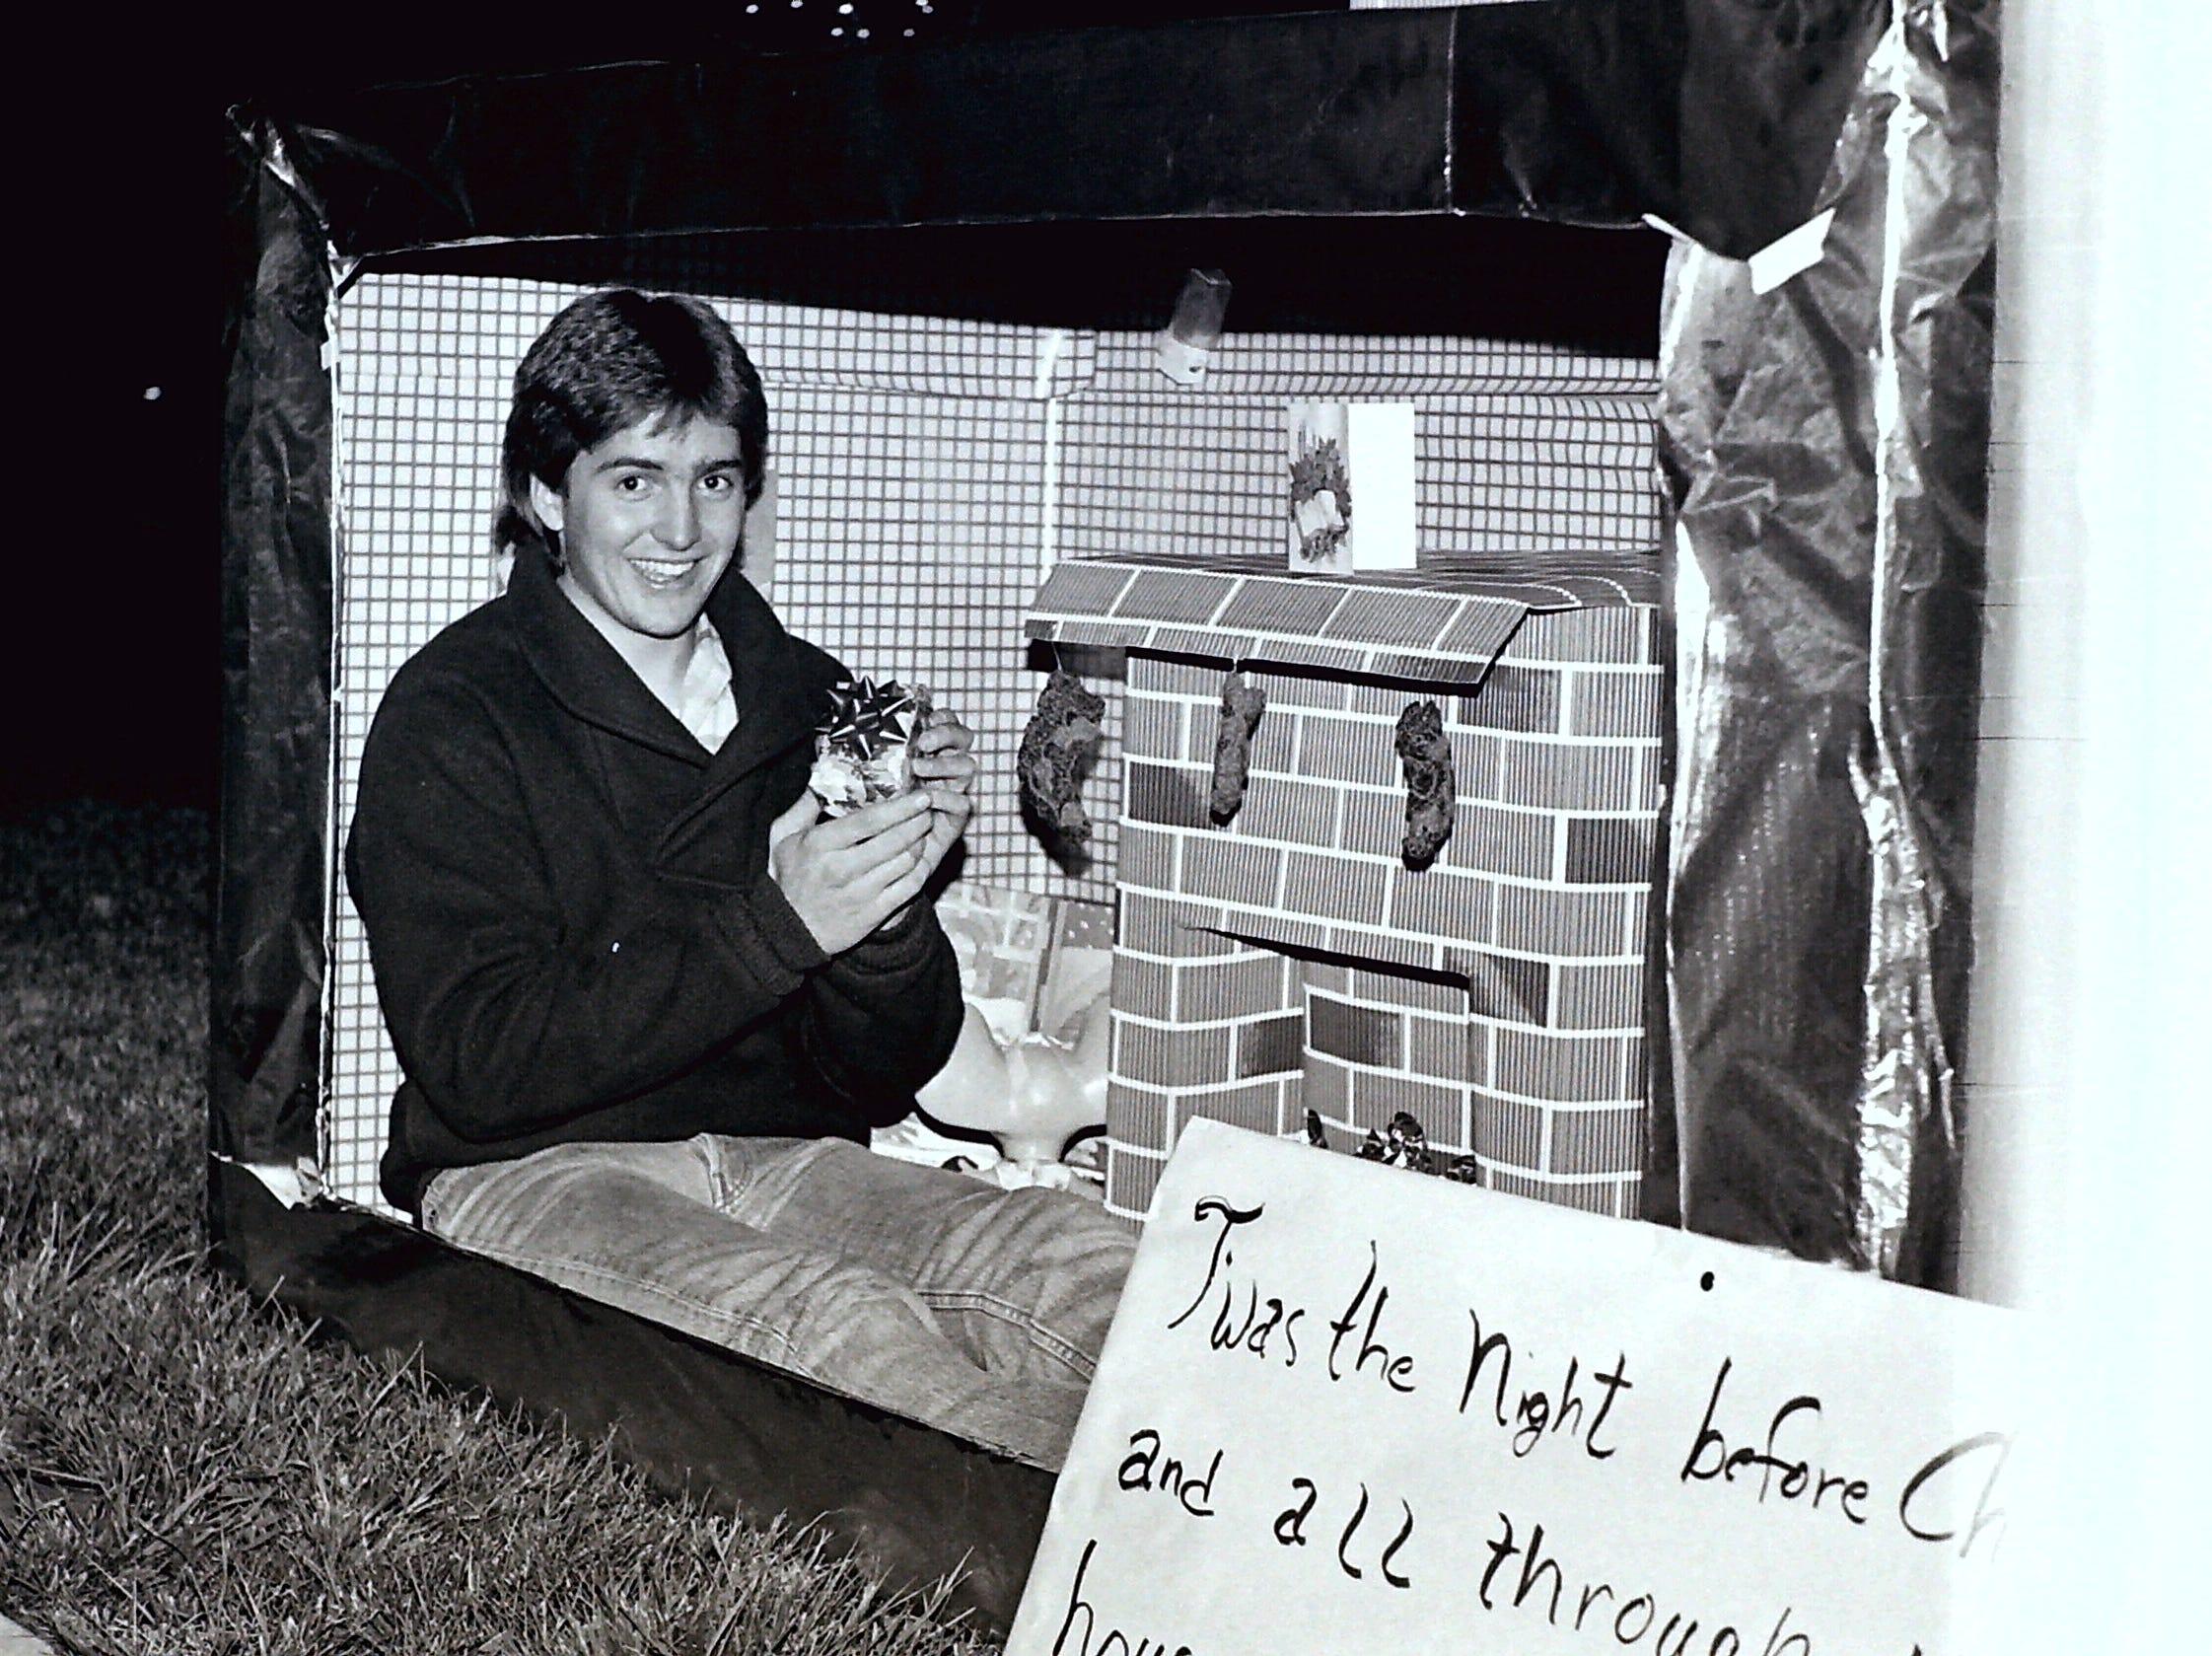 Dixie Center Christmas lighting circa 1985.